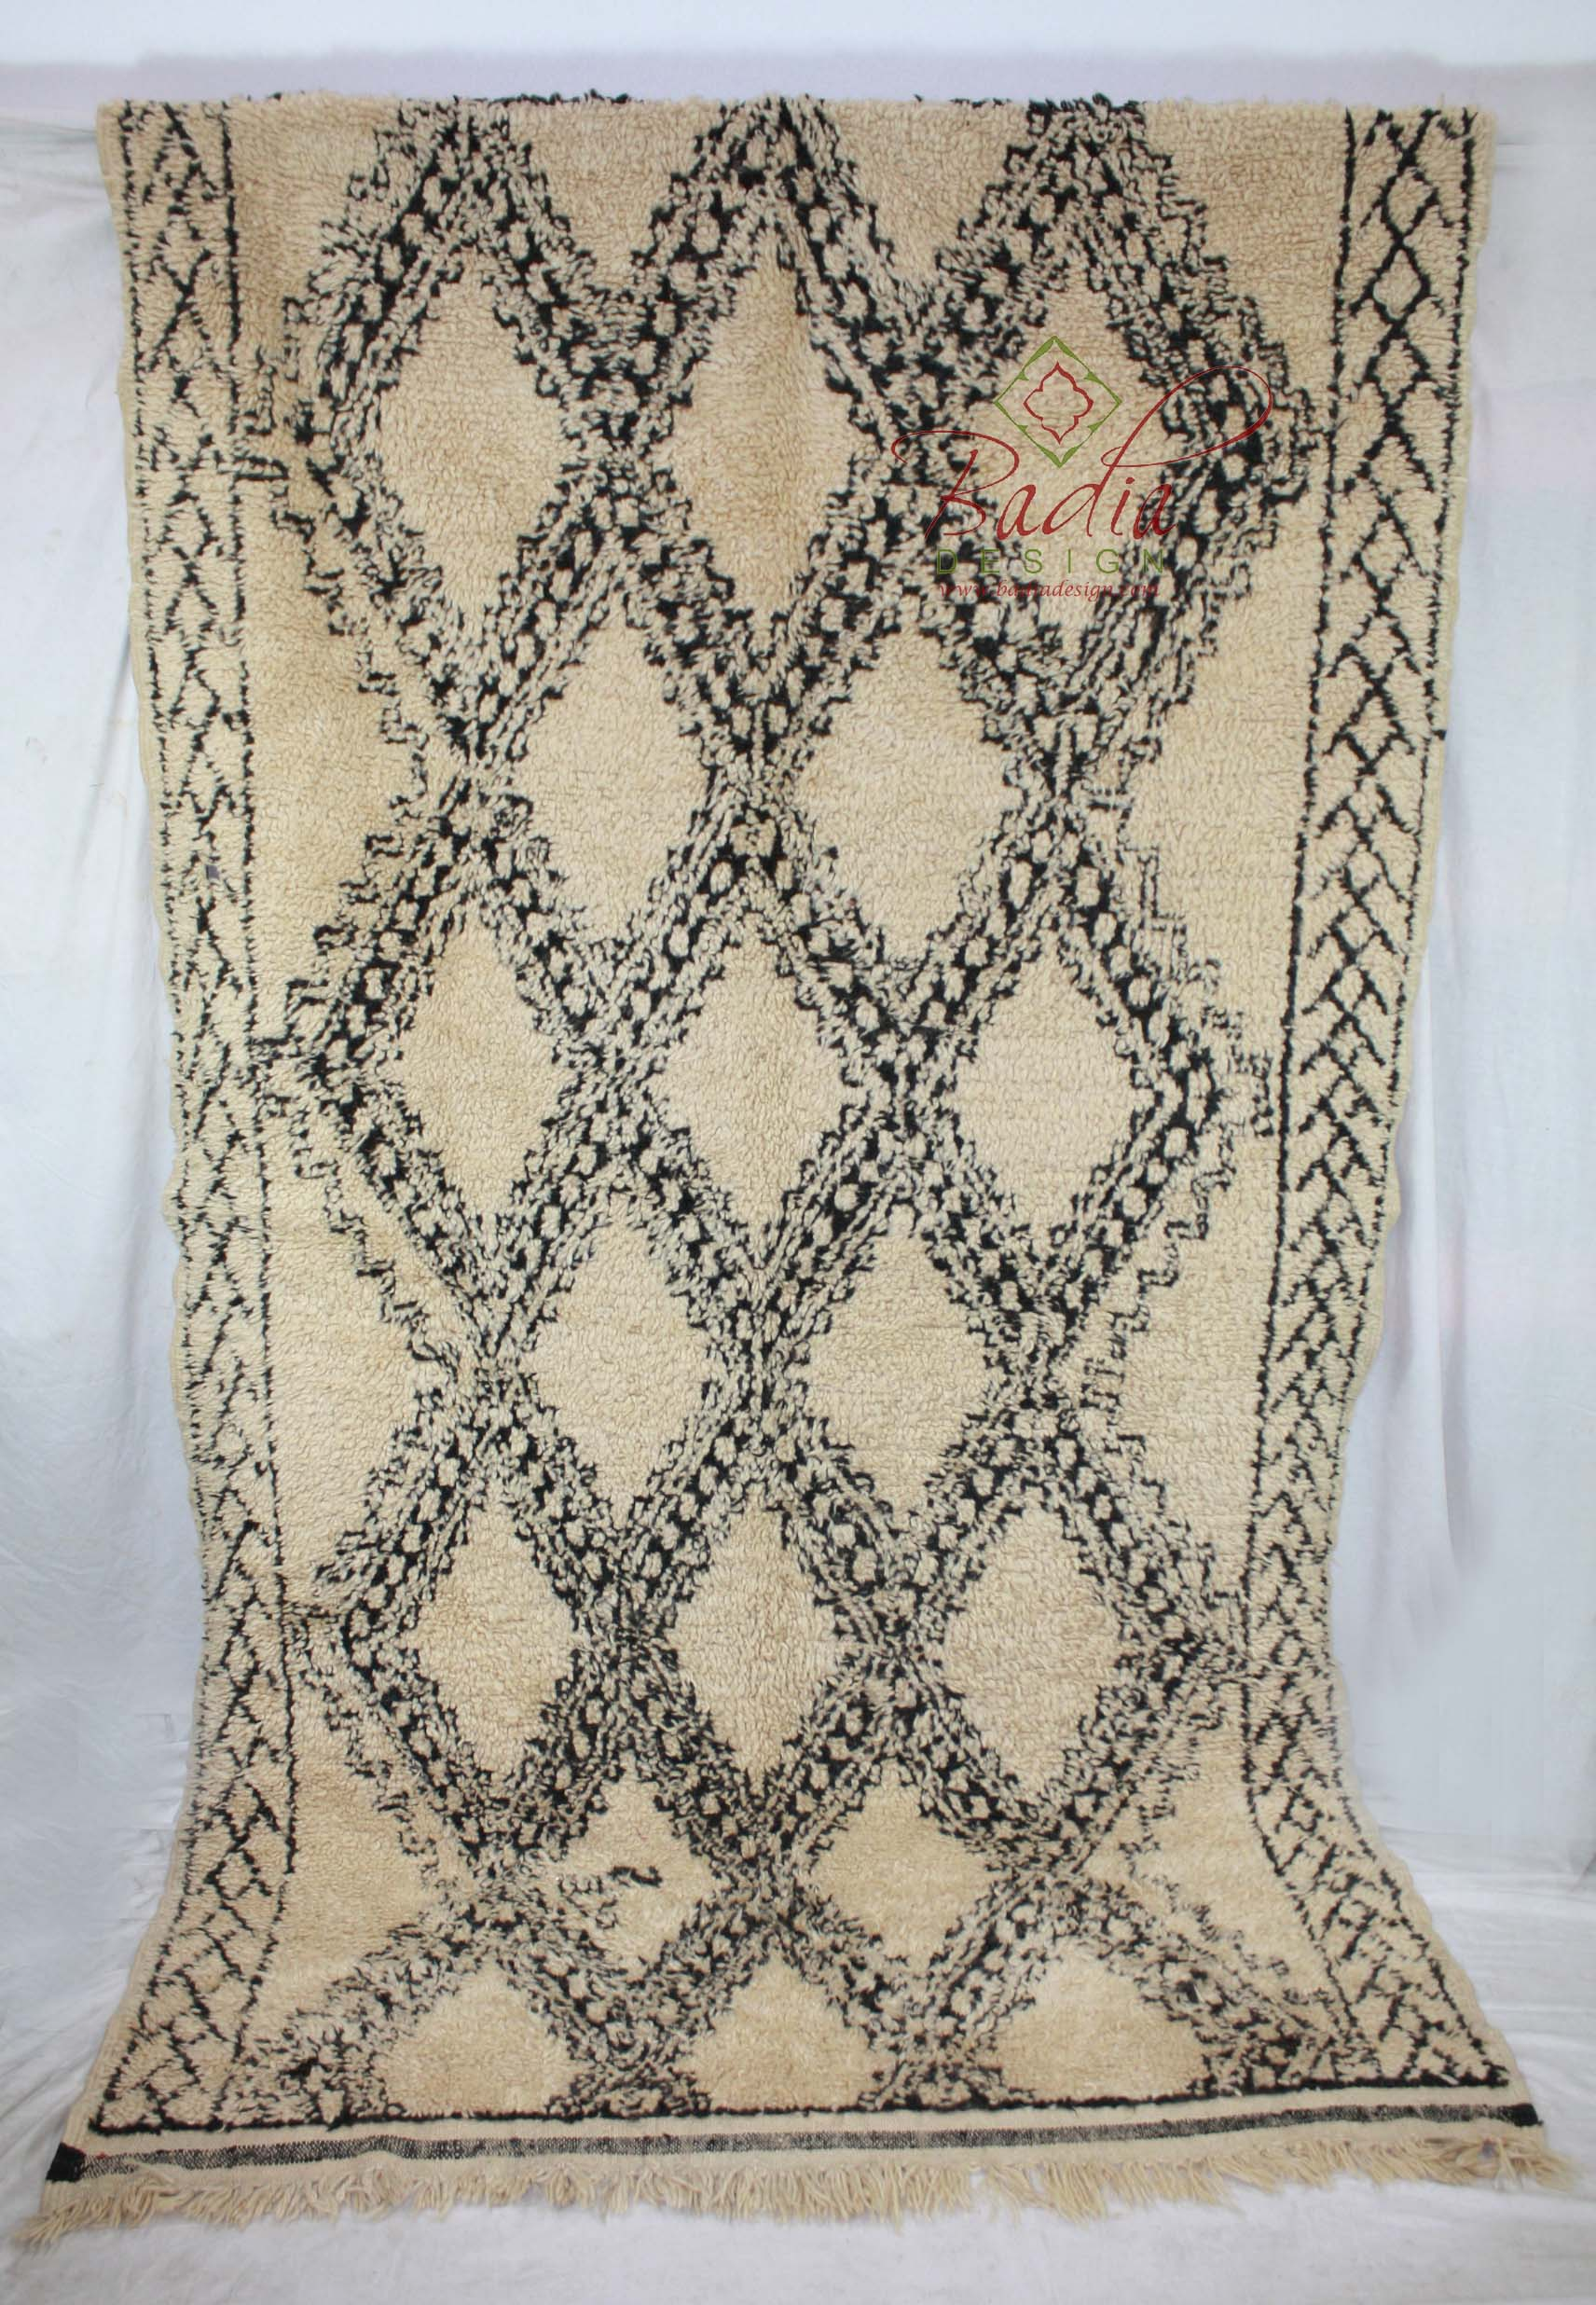 moroccan-beni-ourain-rugs-las-vegas-cpt014.jpg